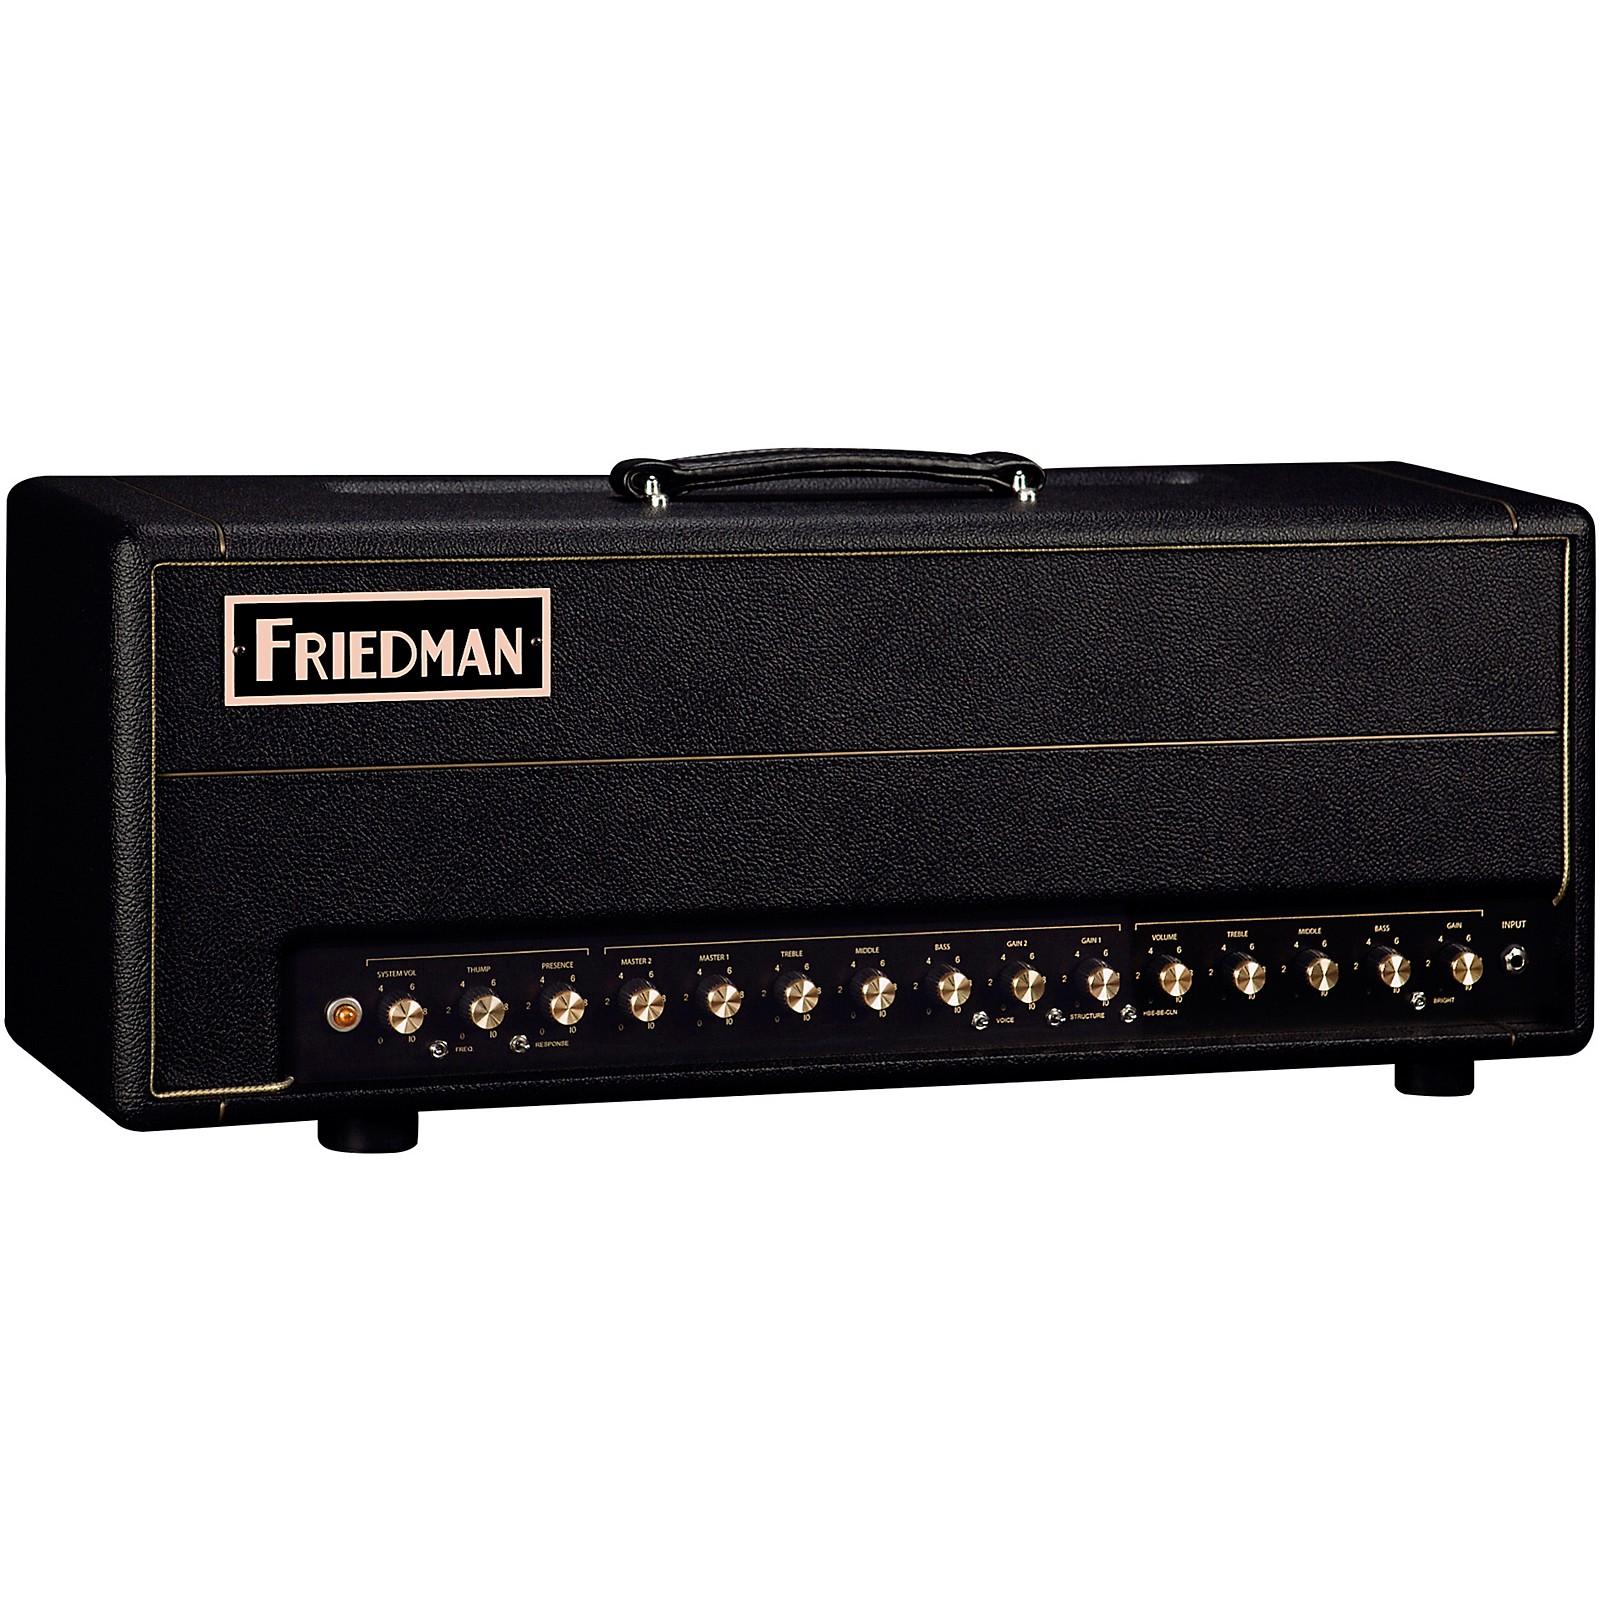 Friedman BE-100 Deluxe 100W Tube Amp Head